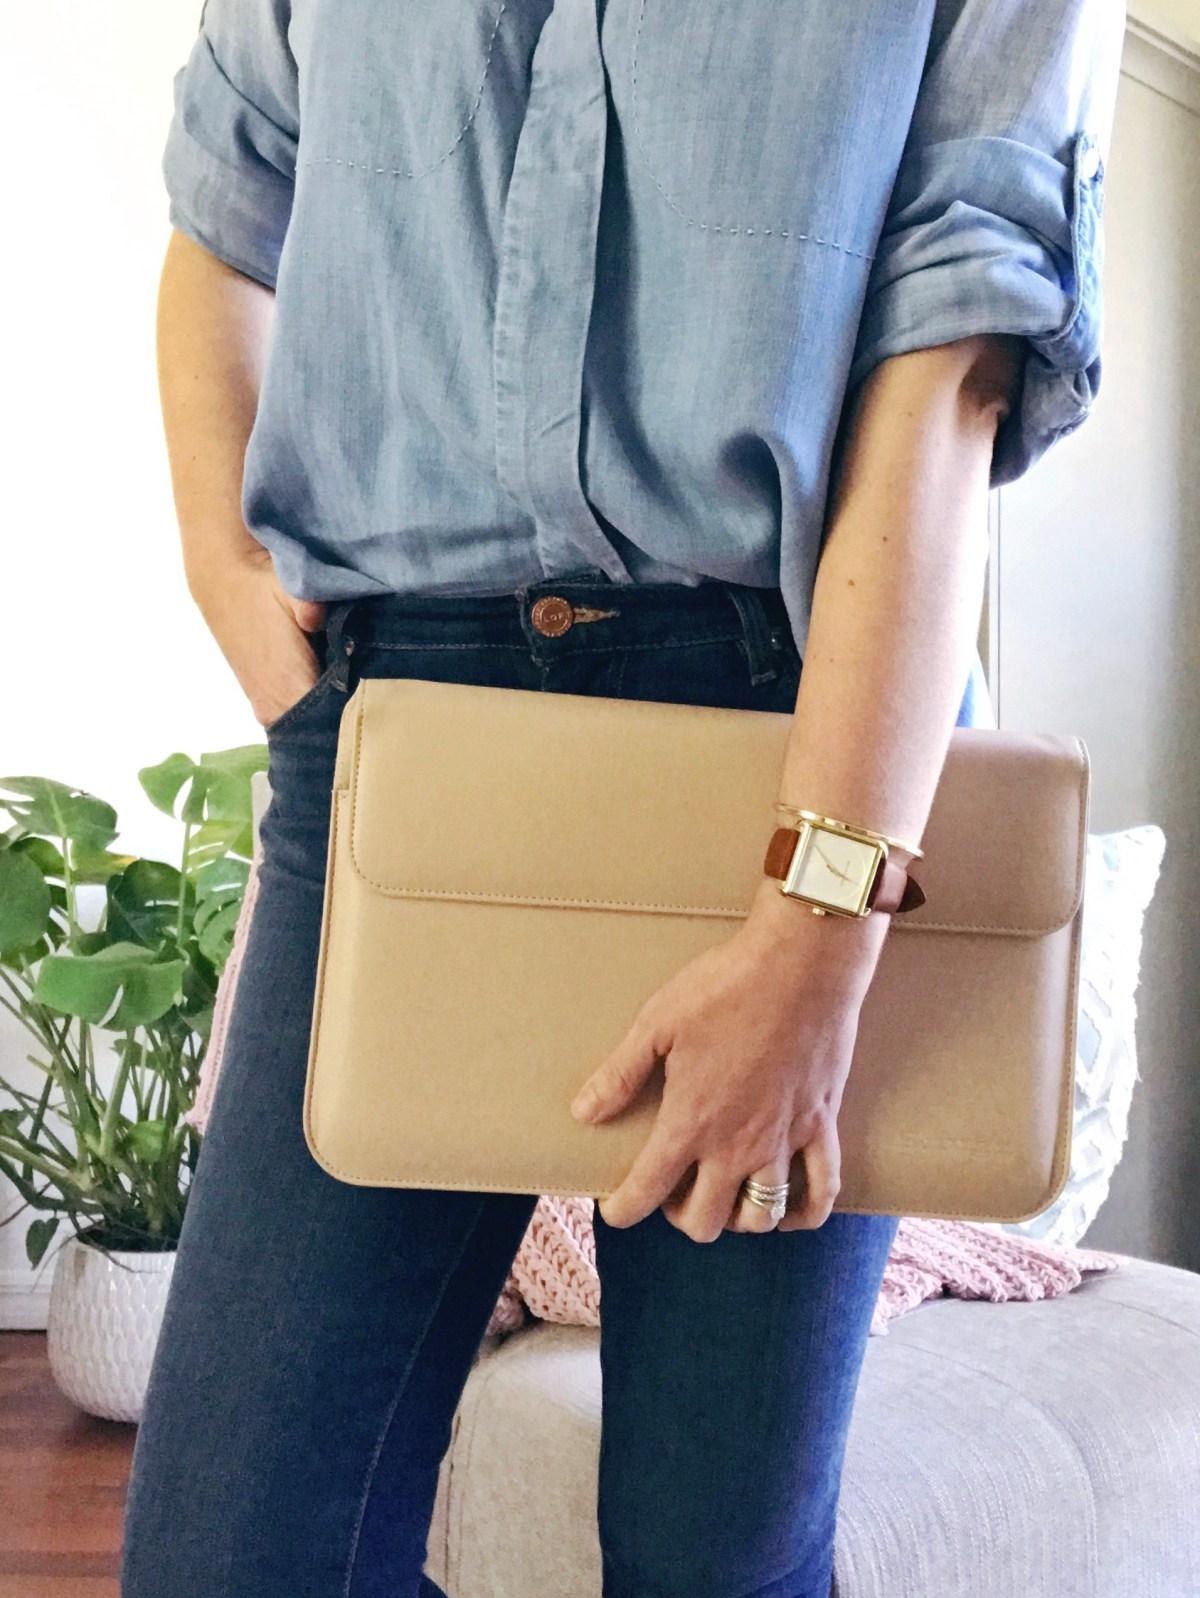 Snugg Nude Leather Macbook Case, Stylish Organization Accessories